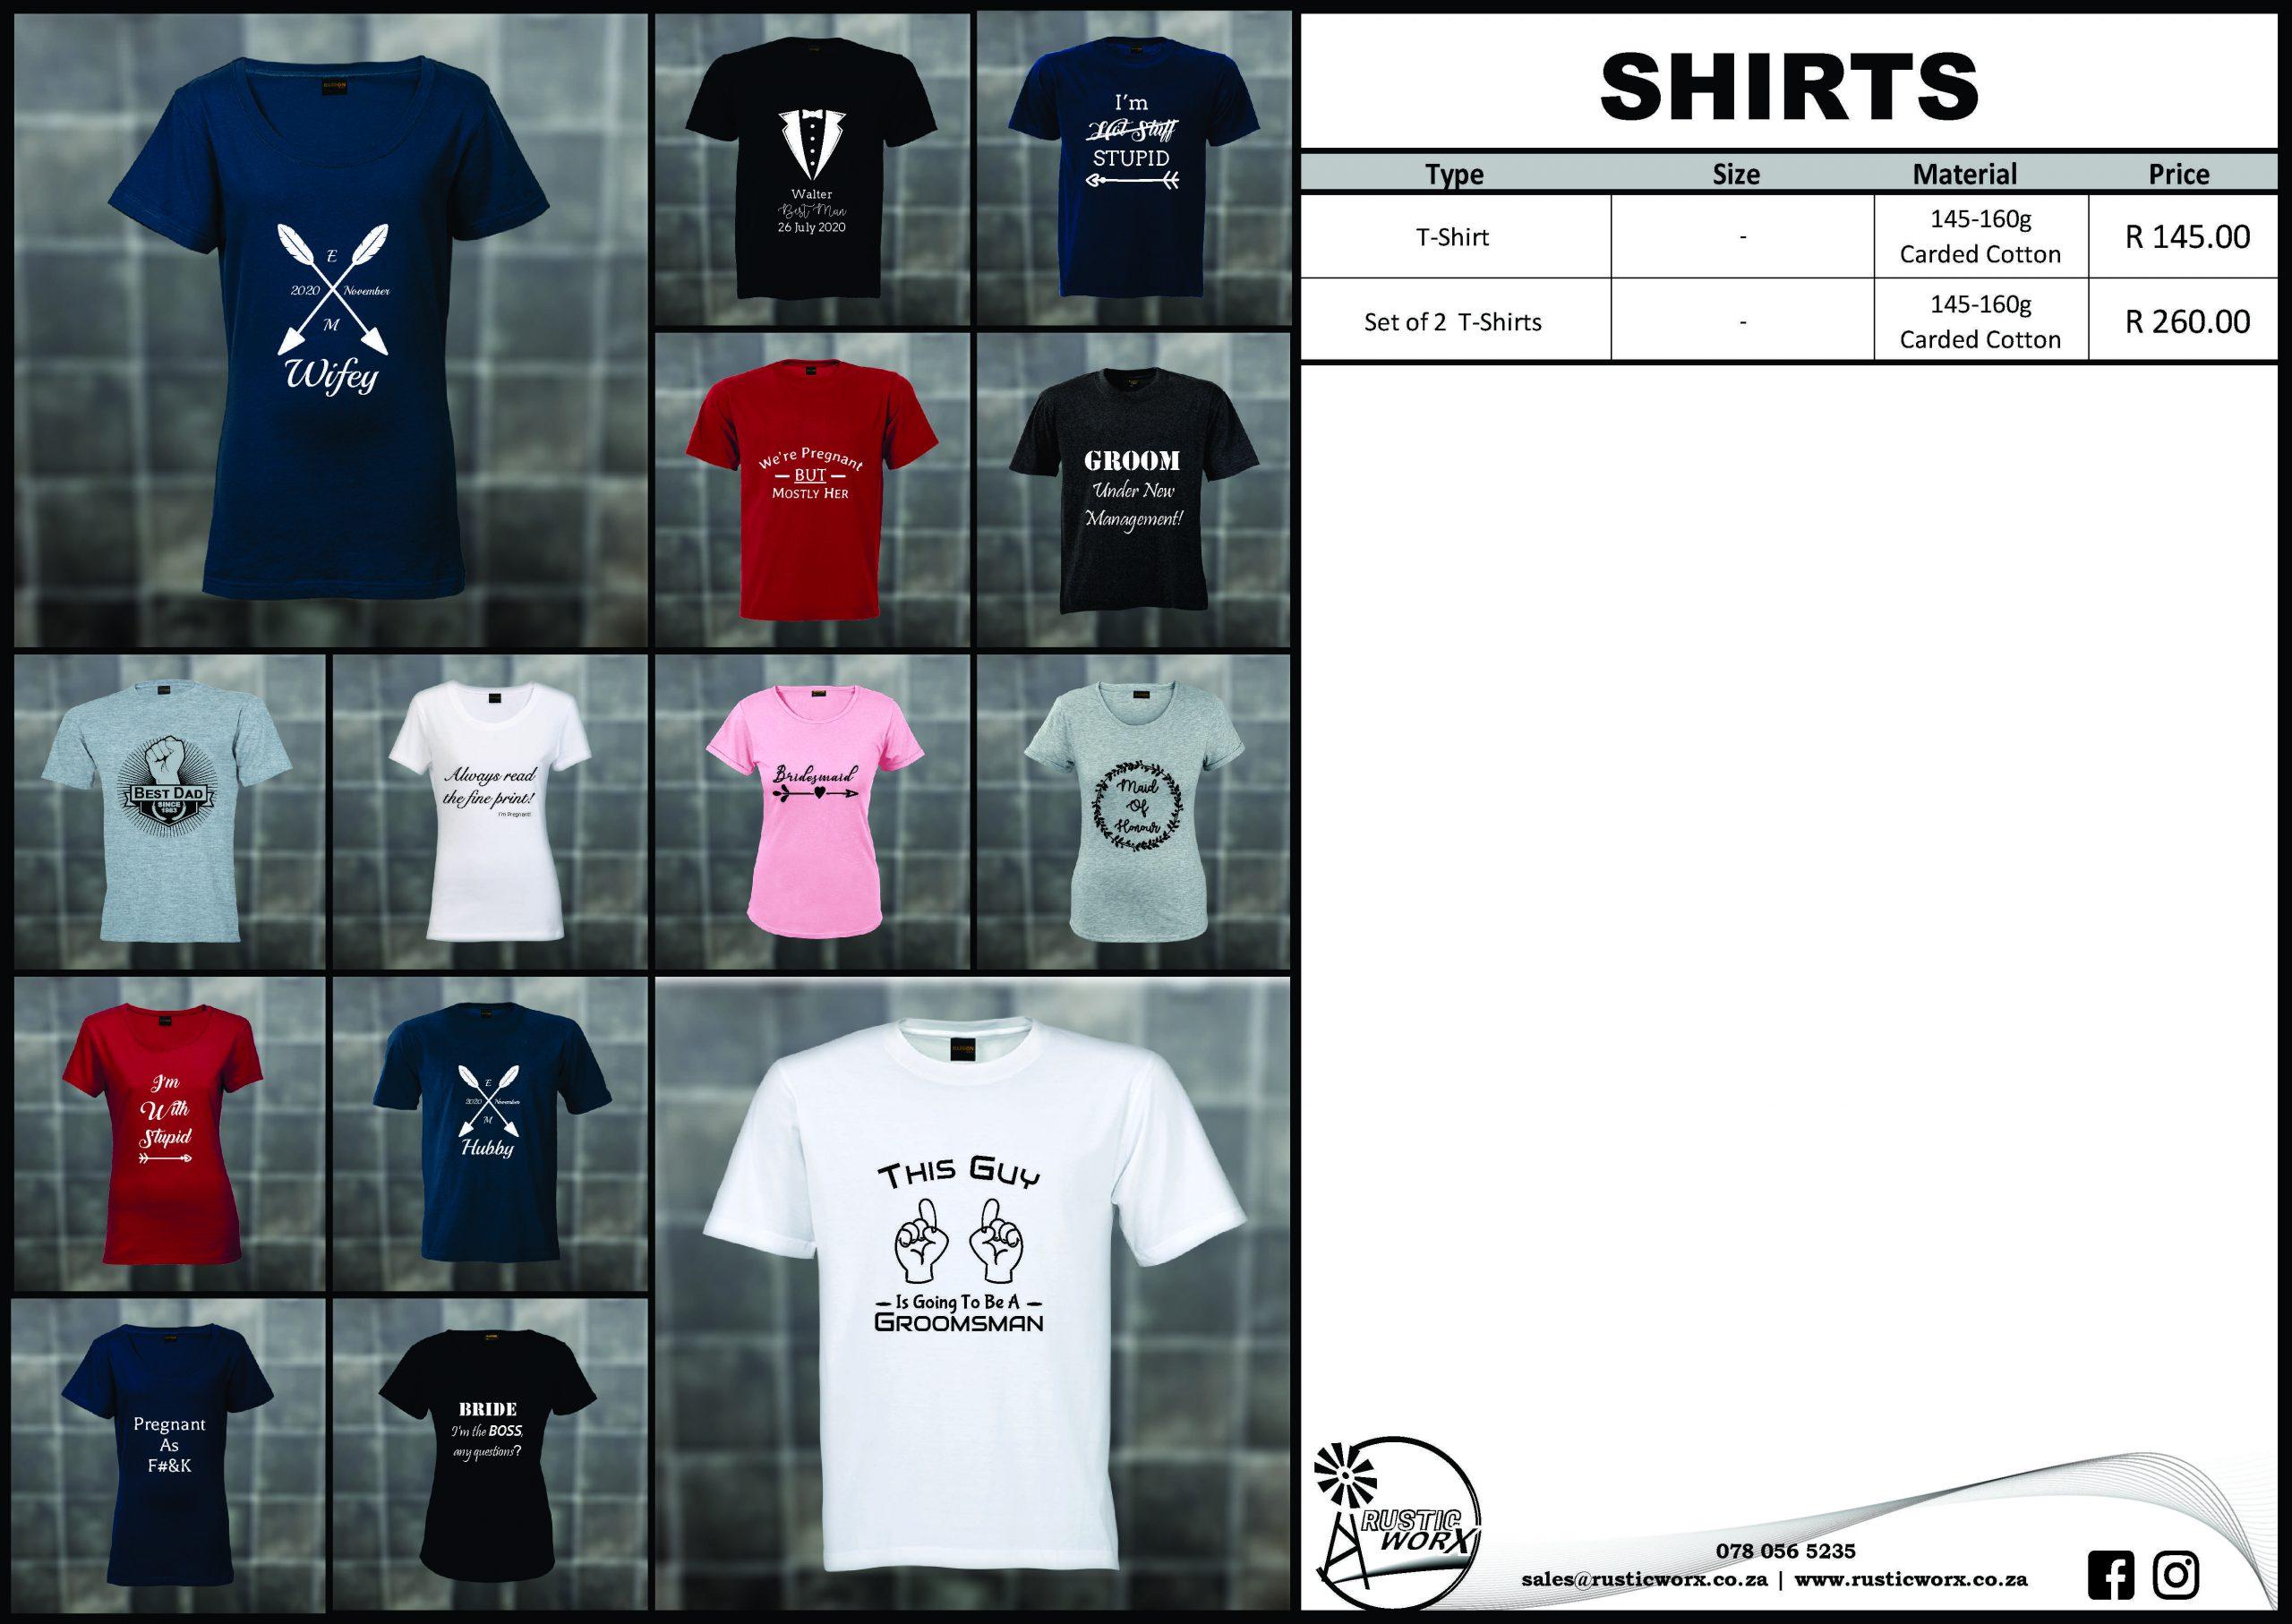 28 Shirts